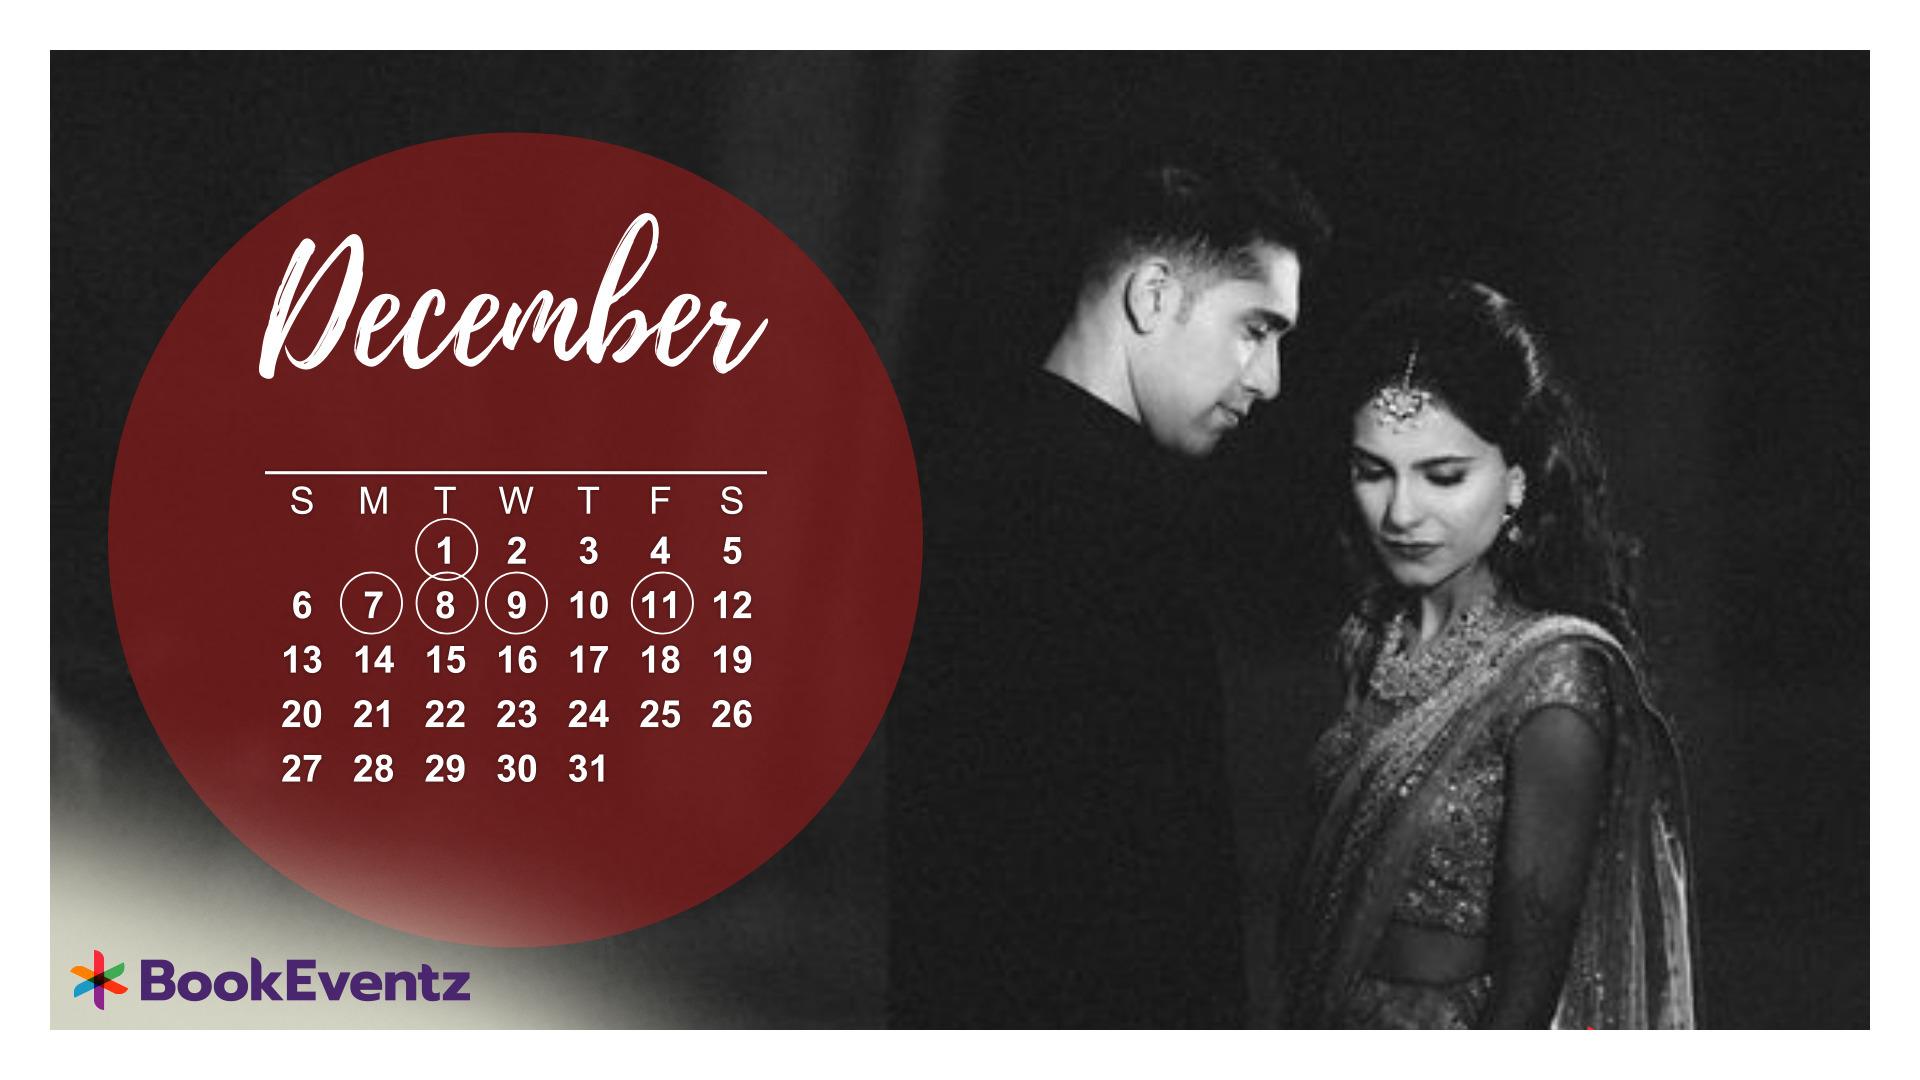 Shubh muhurat, Marriage dates in 2020, Wedding dates 2020, Hindu calendar 2020, Marriage muhurat in 2020, hindu calendar 2020, shadi muhurat in 2020, Wedding Dates